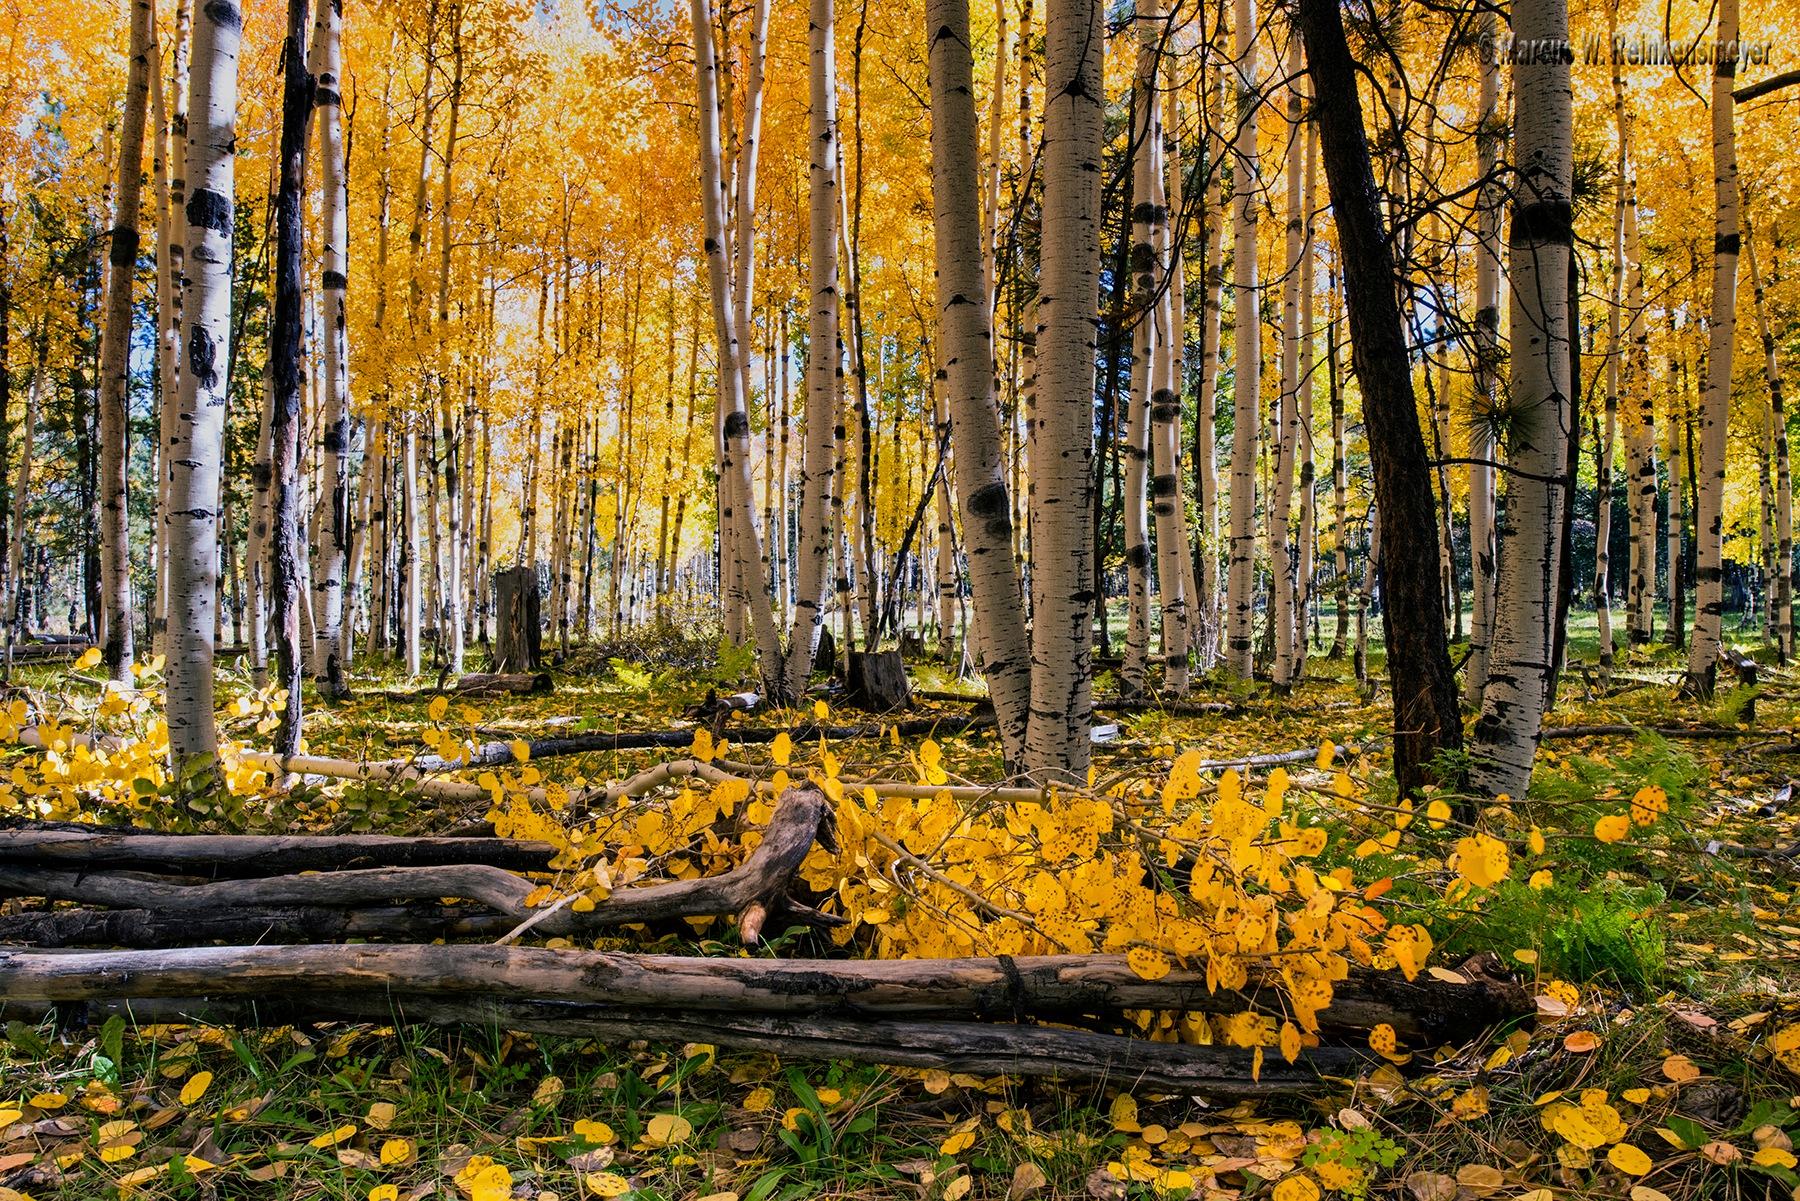 Autumn Aspens Aglow  by reinkensmeyer